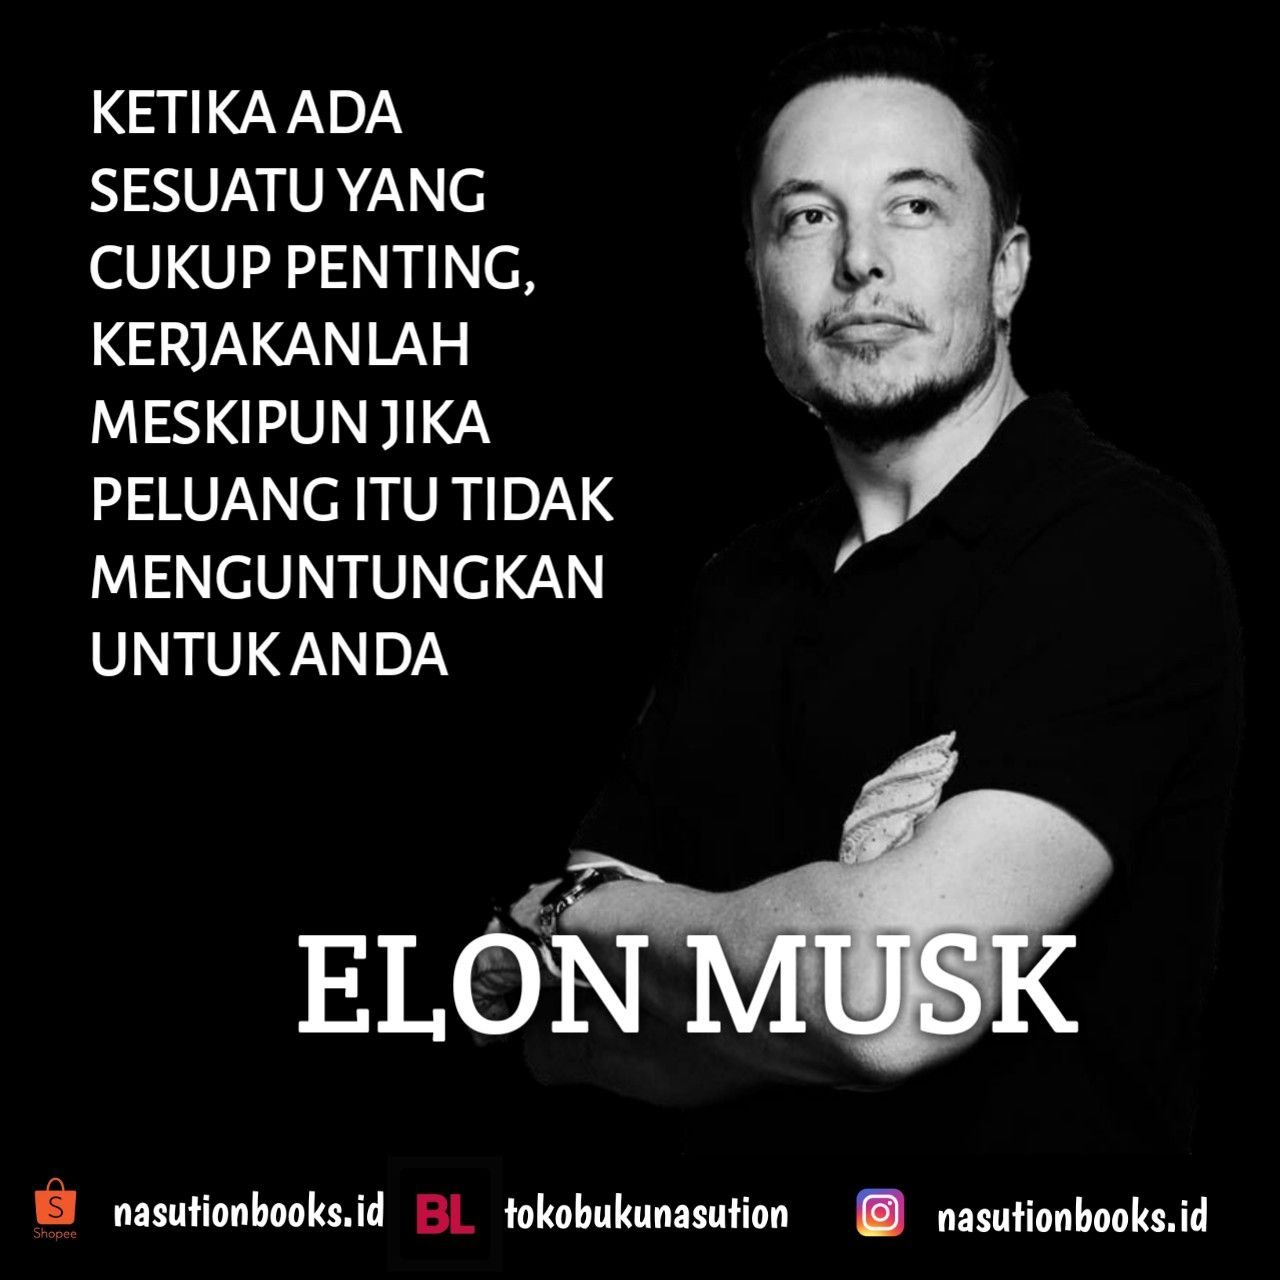 Elon Musk Kata Kata Indah Kata Kata Motivasi Motivasi